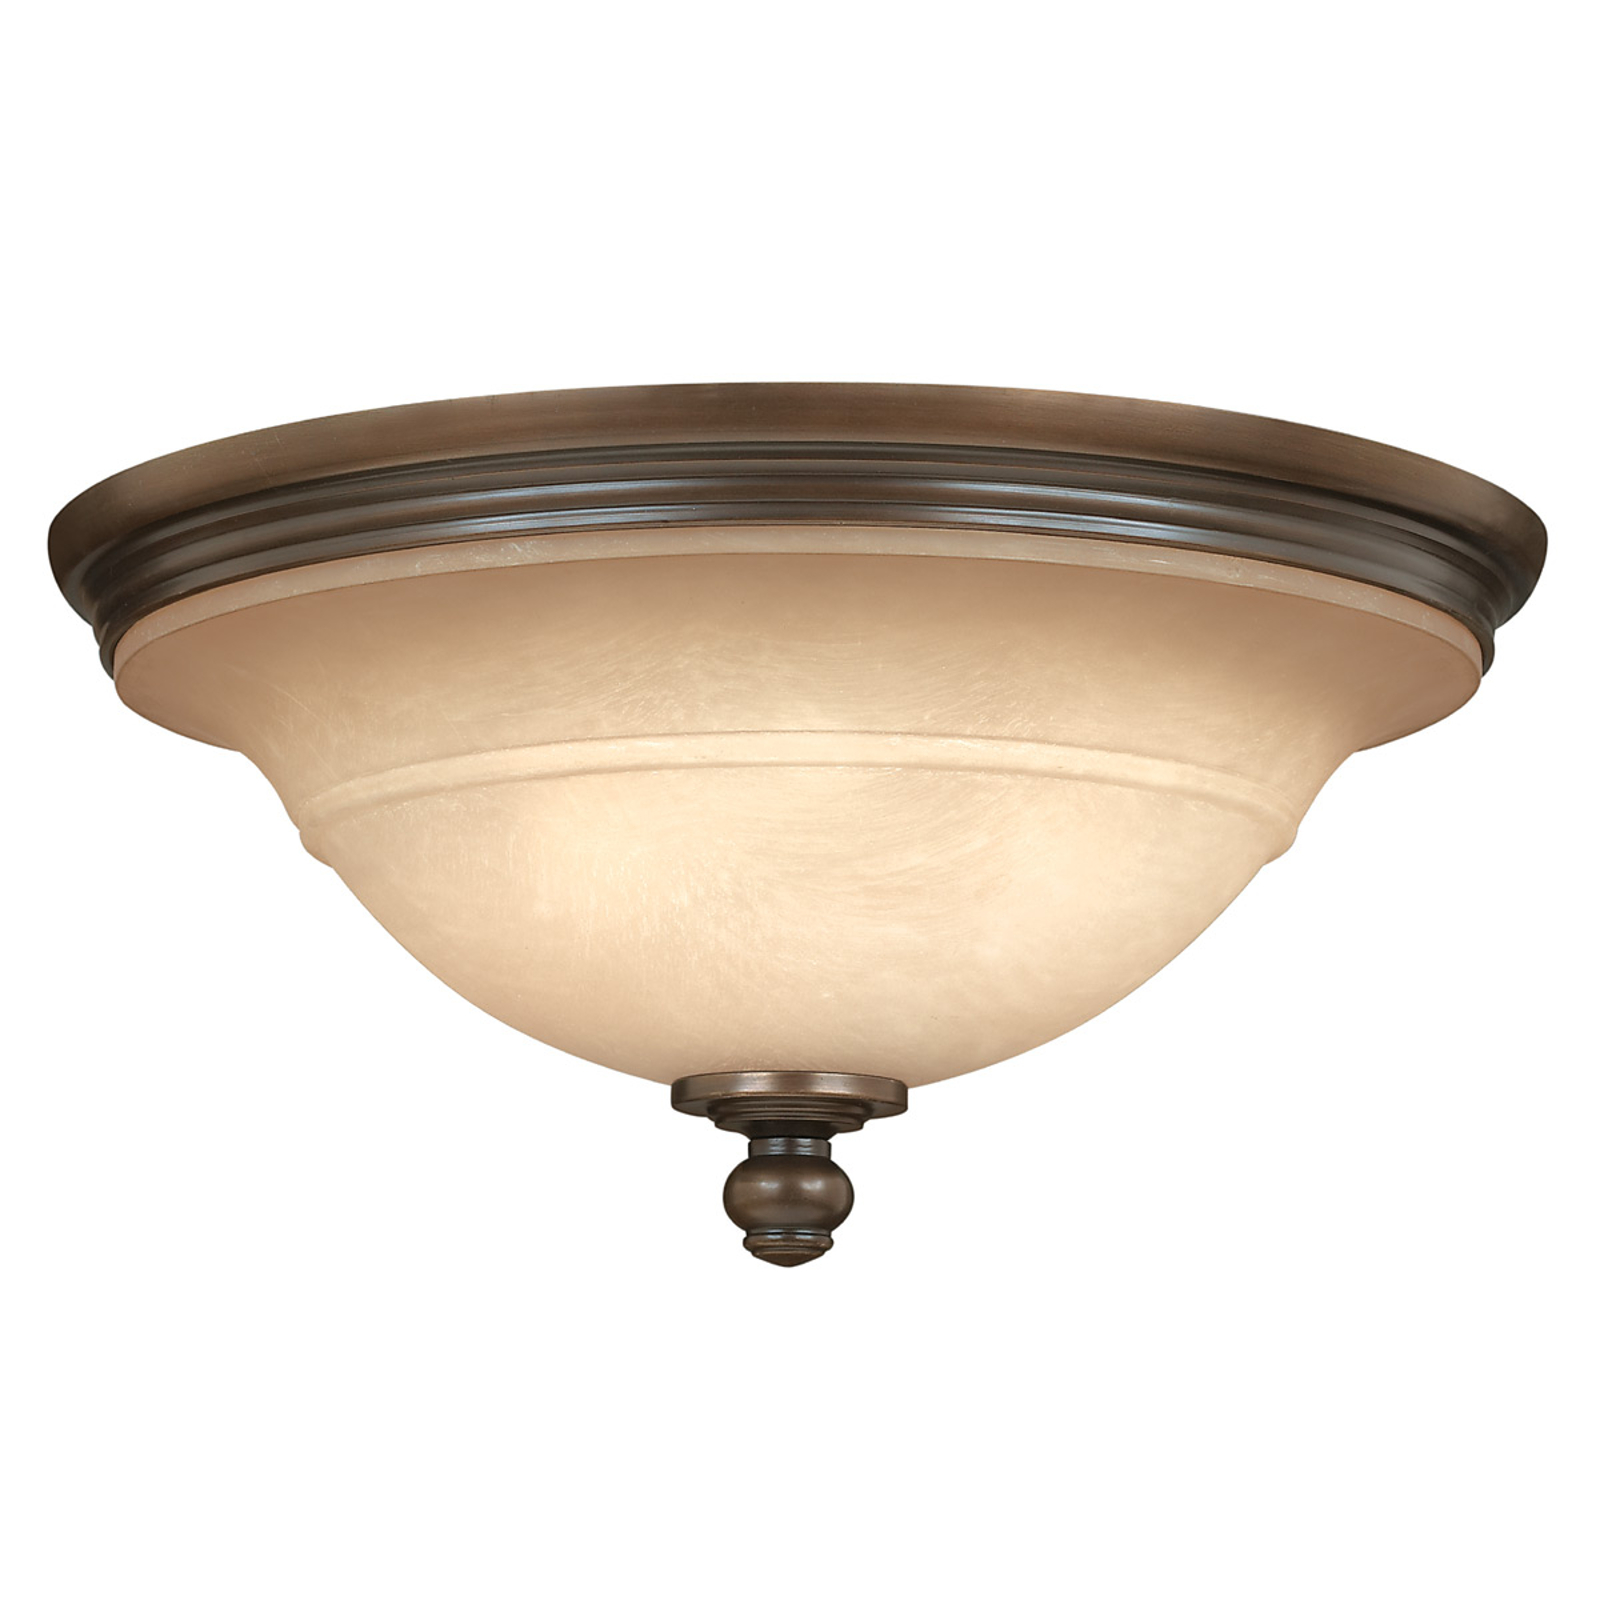 PLYMOUTH rustik loftlampe